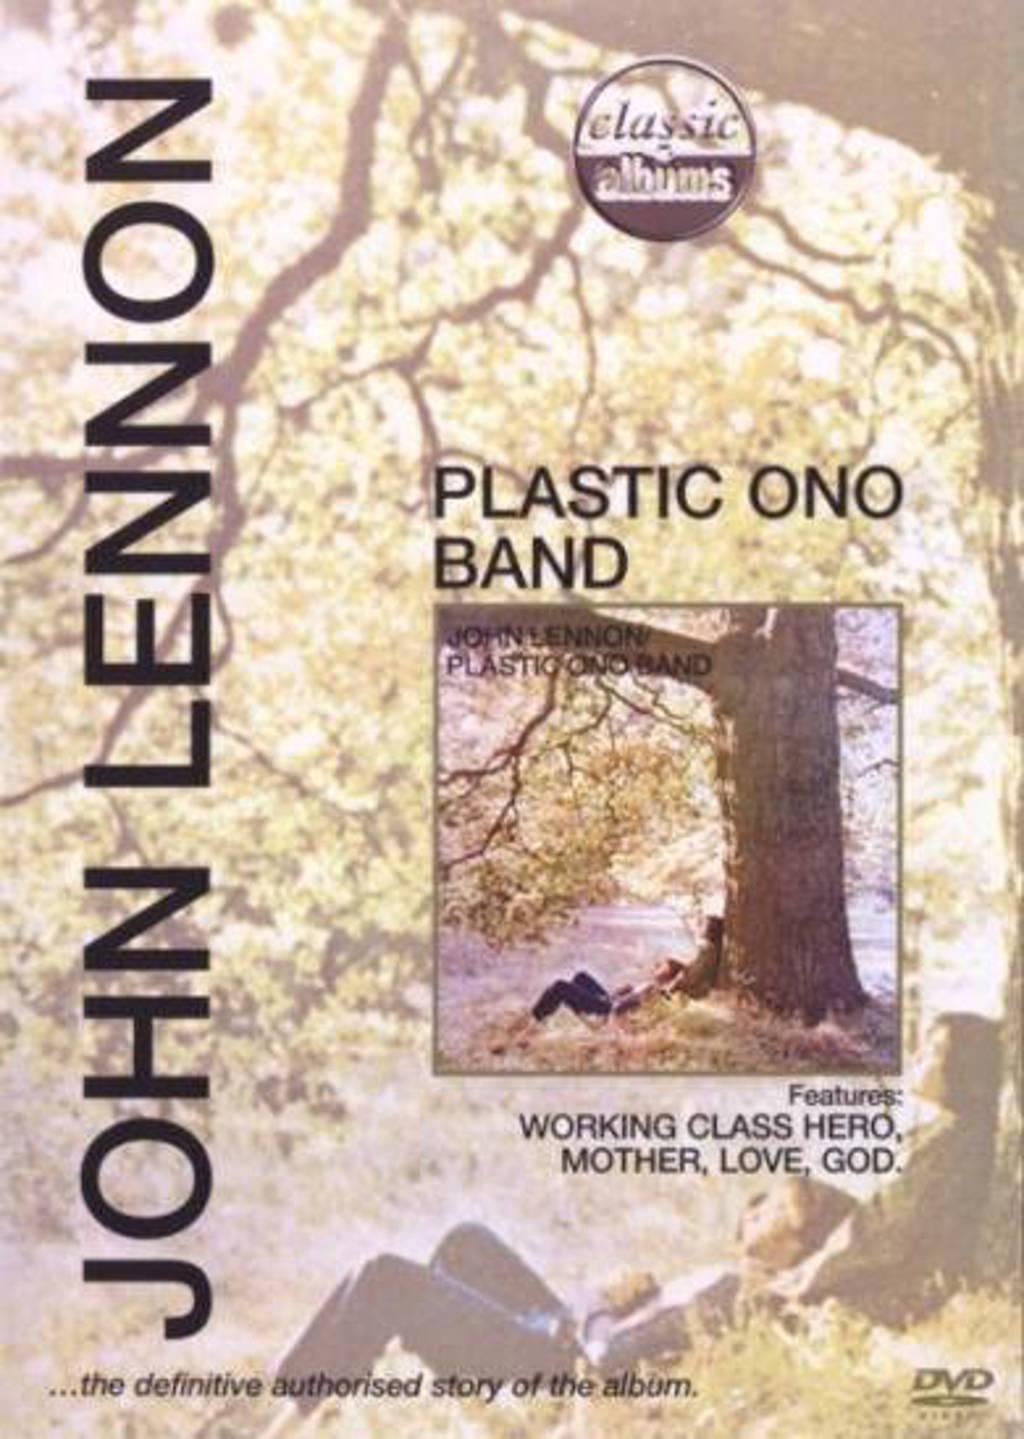 John Lennon - plastic ono band (DVD)